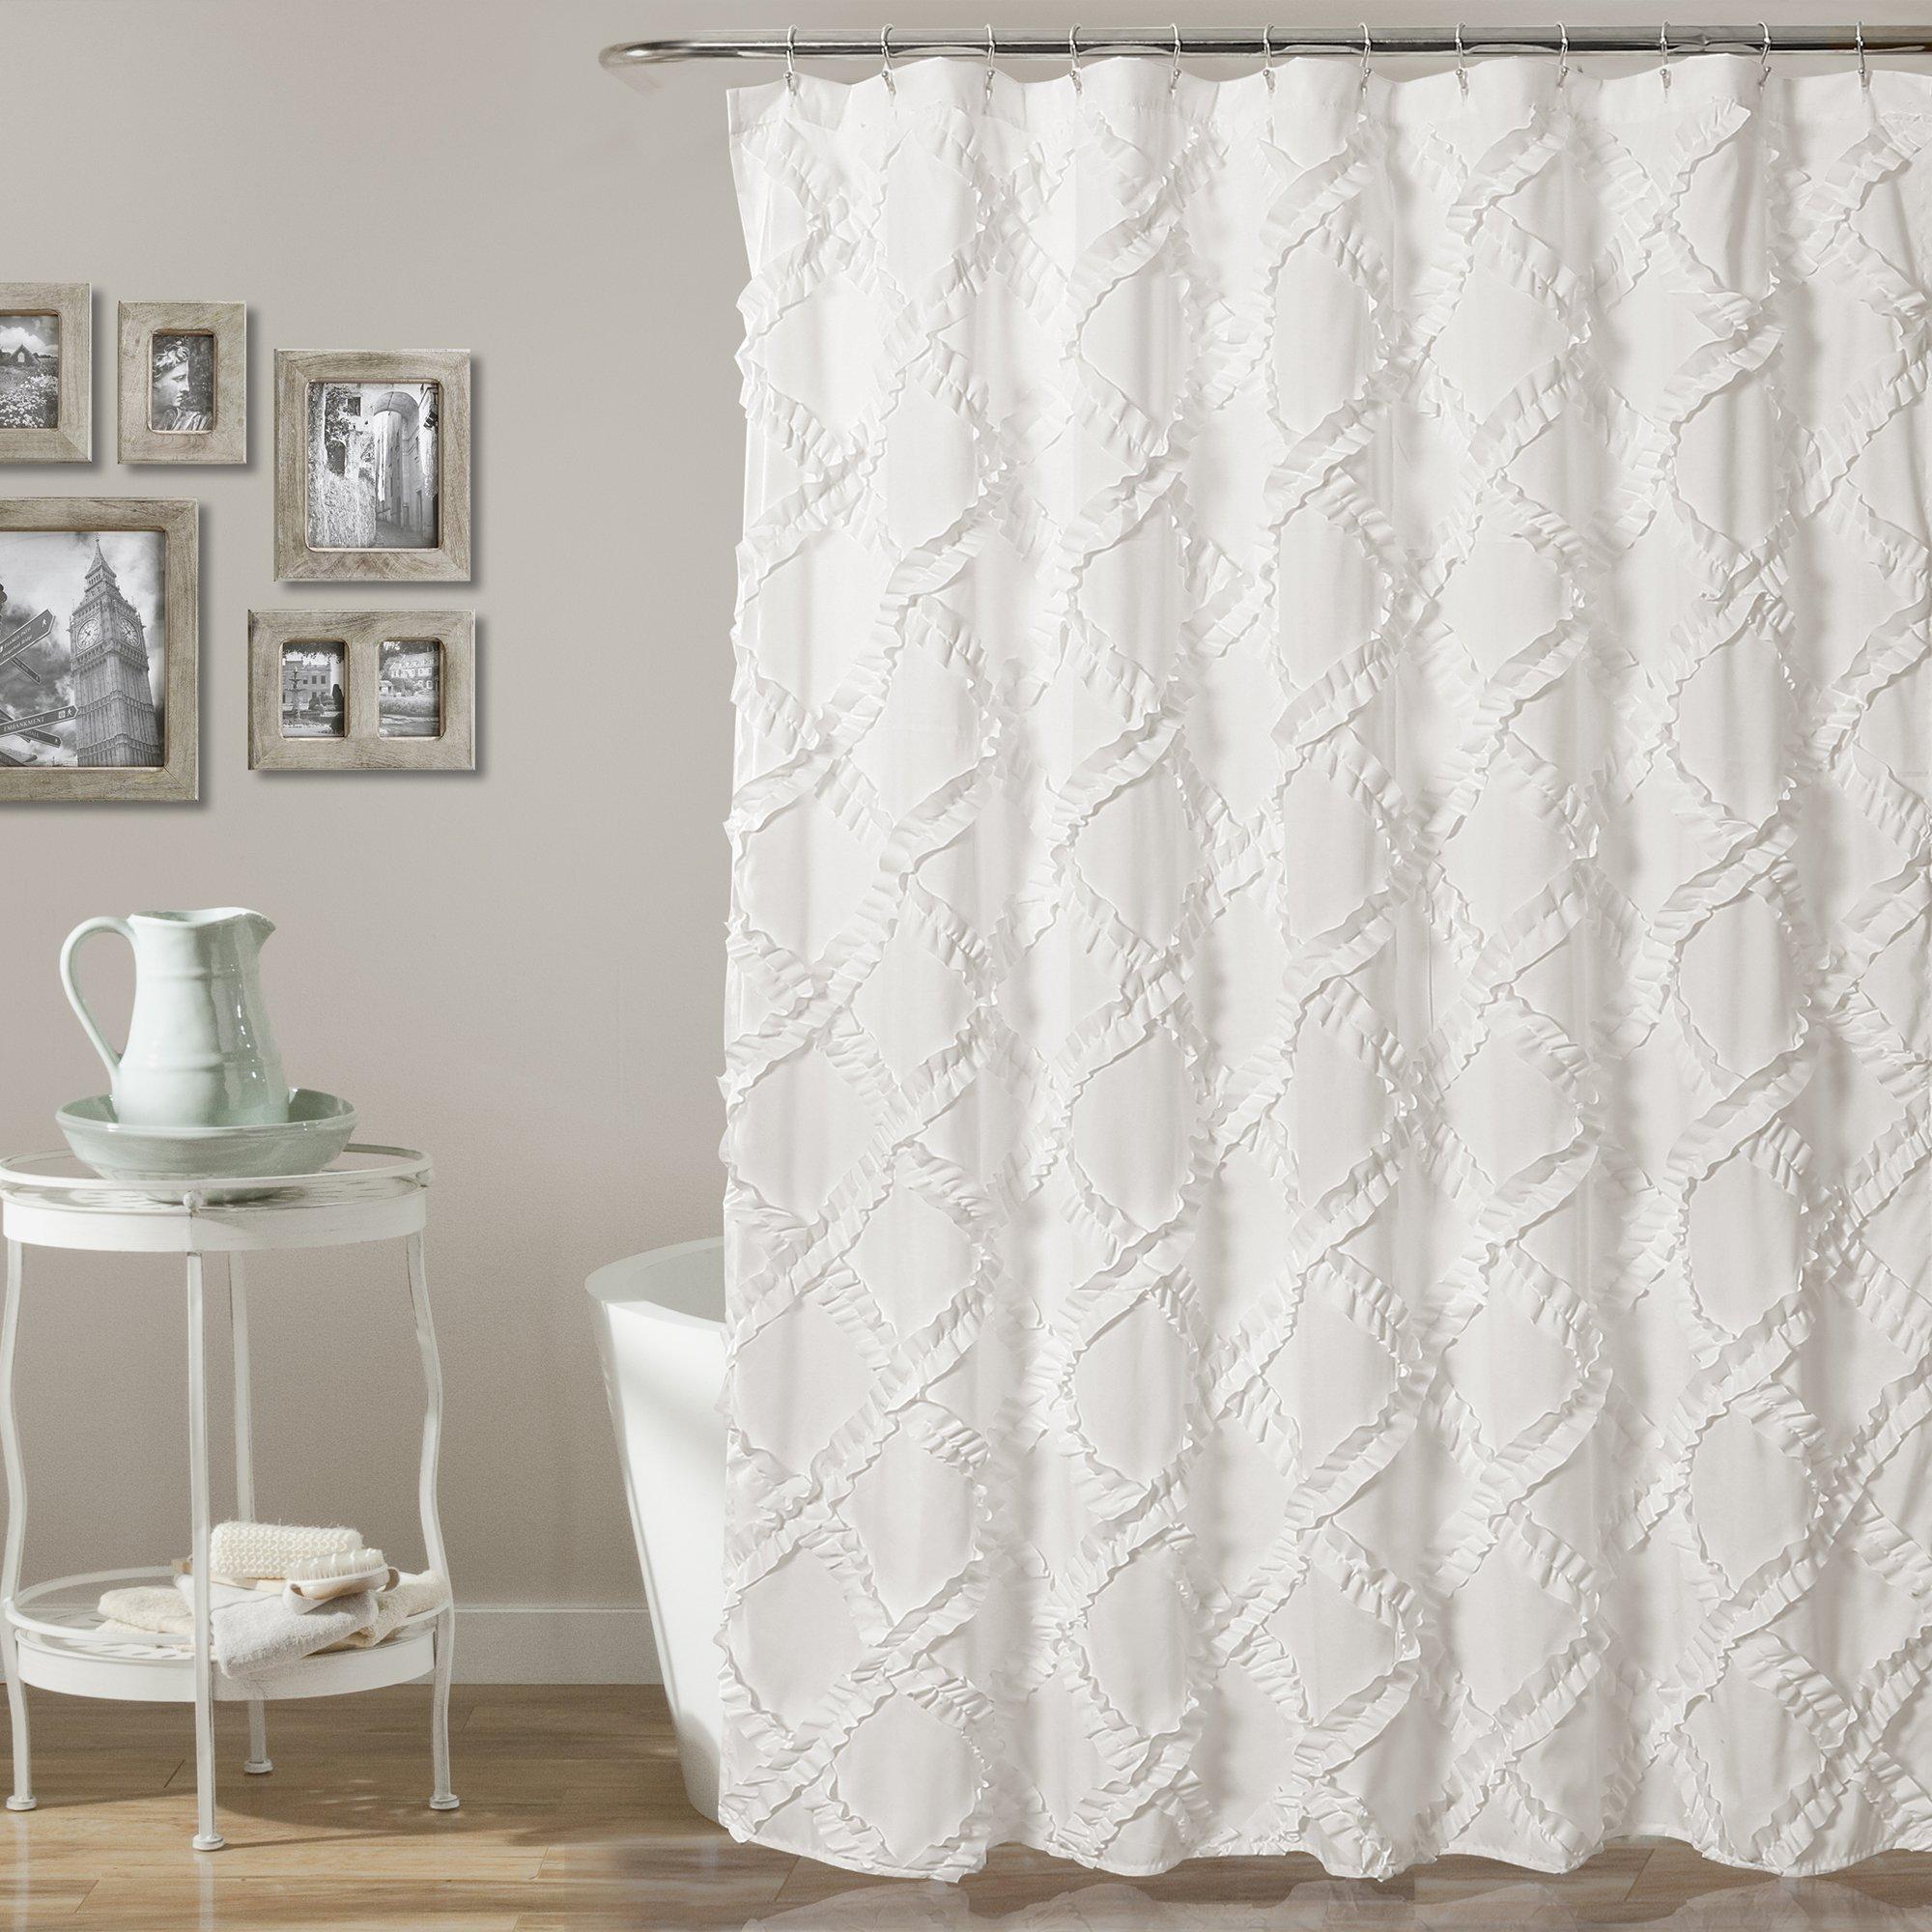 Lush Decor Ruffle Diamond Shower Curtain, Gray